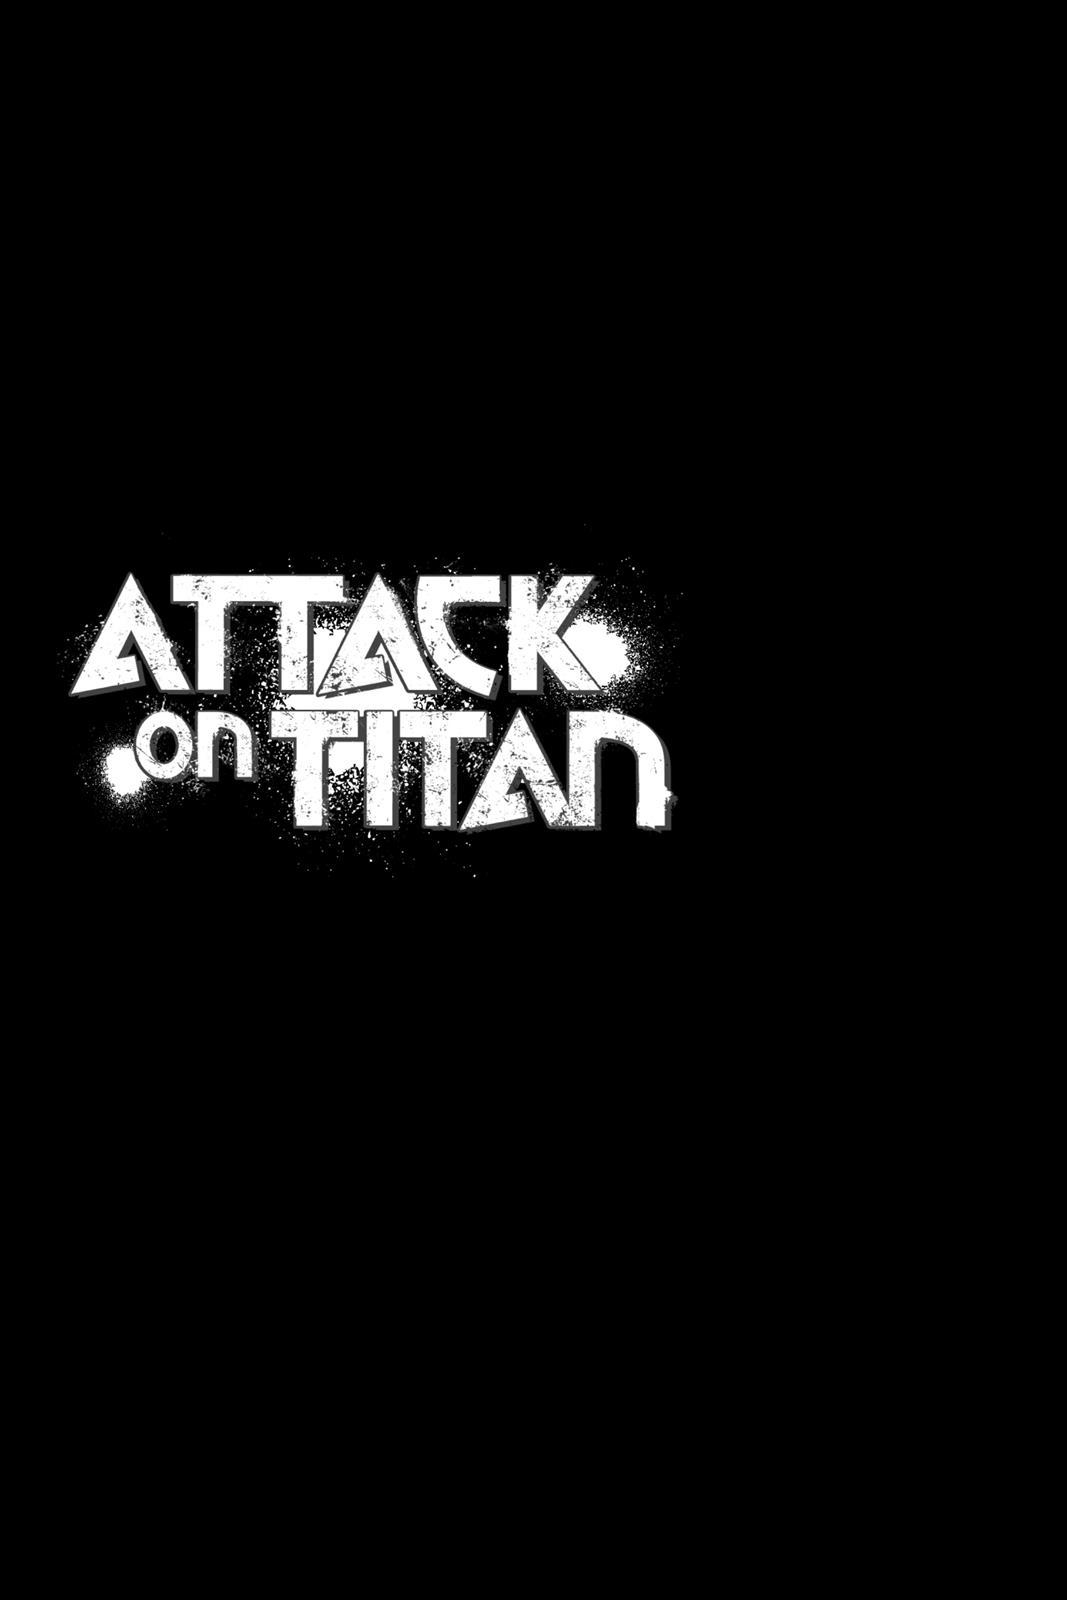 Attack On Titan, Episode 109 image 046